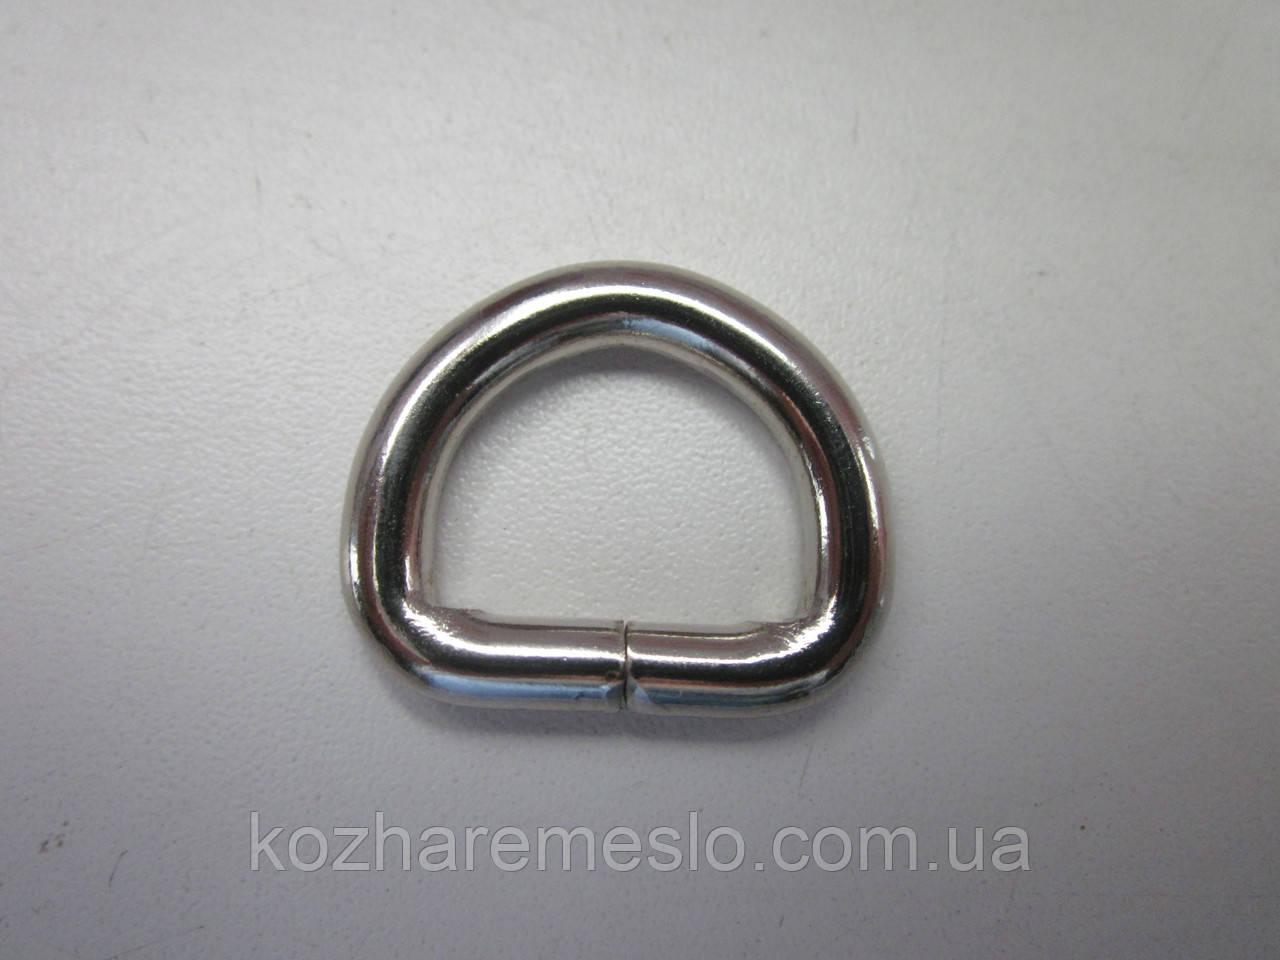 Полукольцо 4 х 20  х 15 мм никель